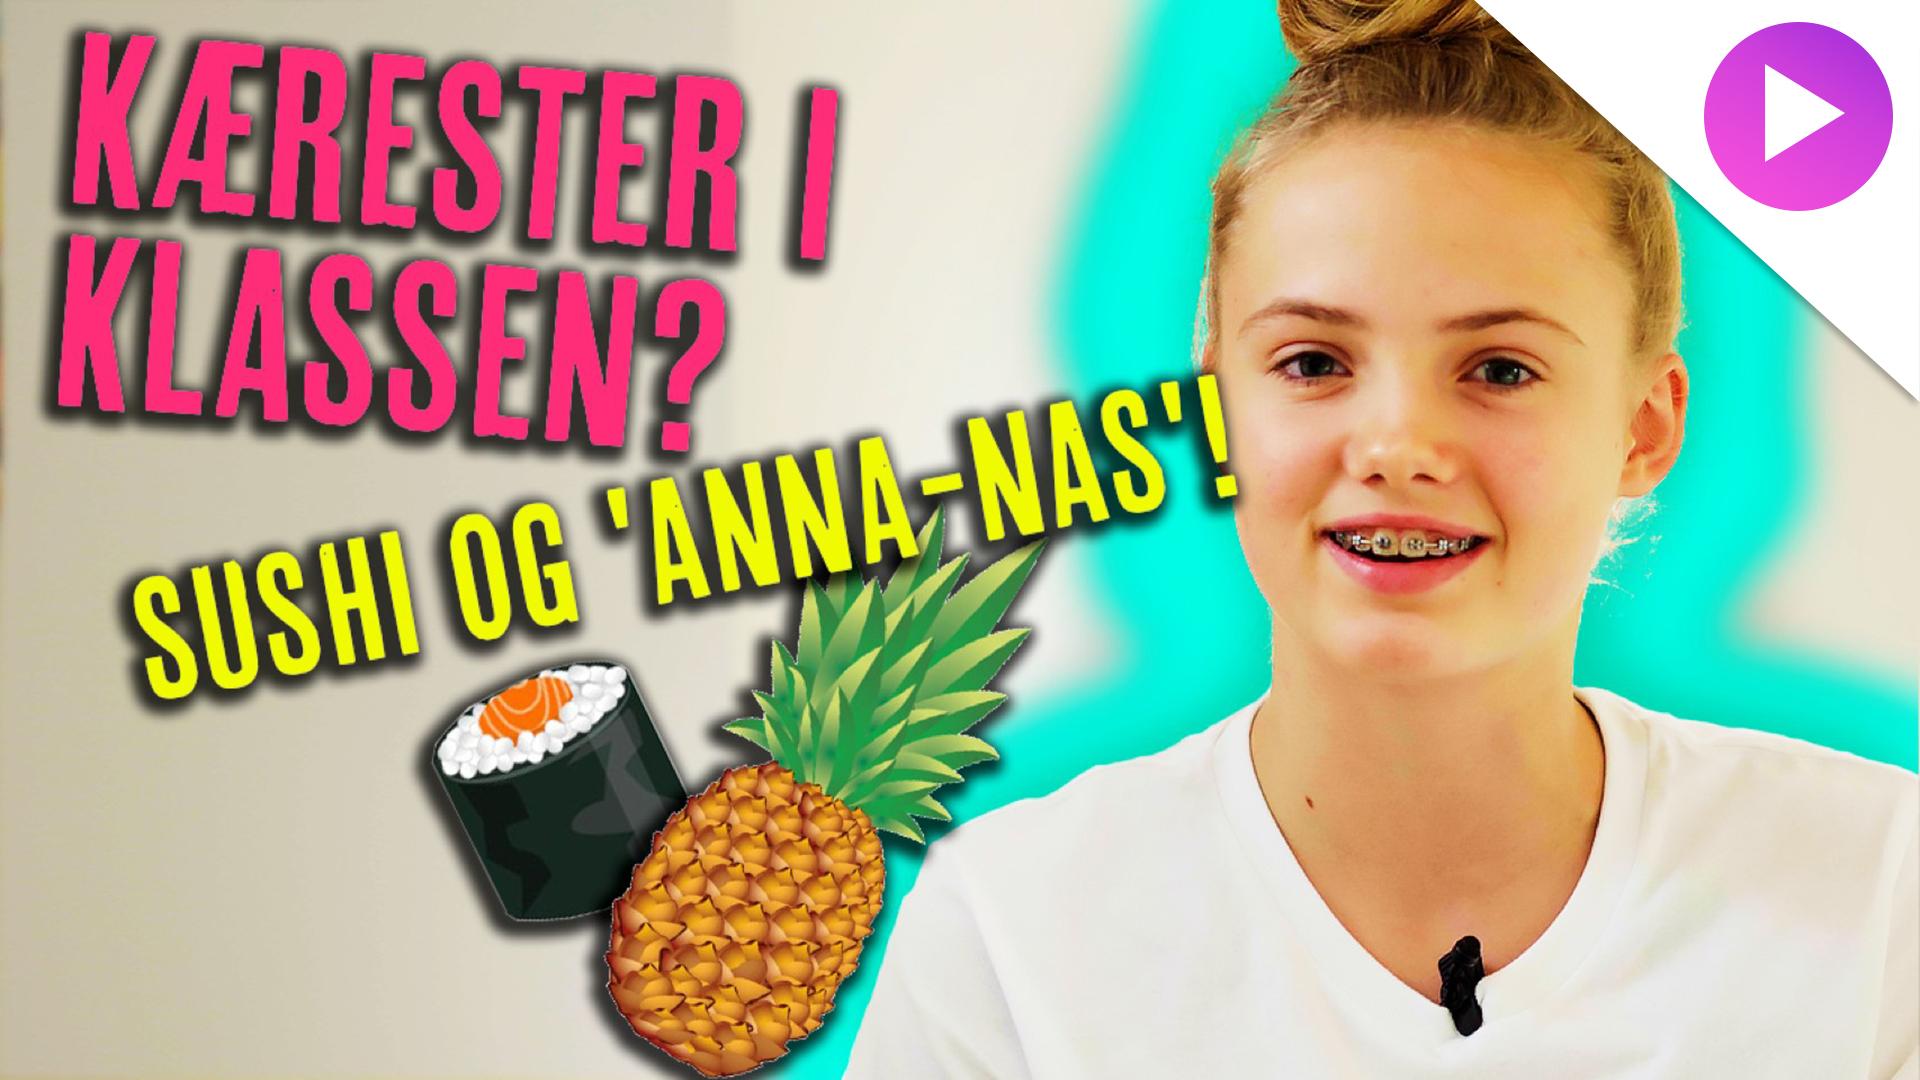 spoerg_klassen_anna_sushi_og_anna_nas_drupal.jpg